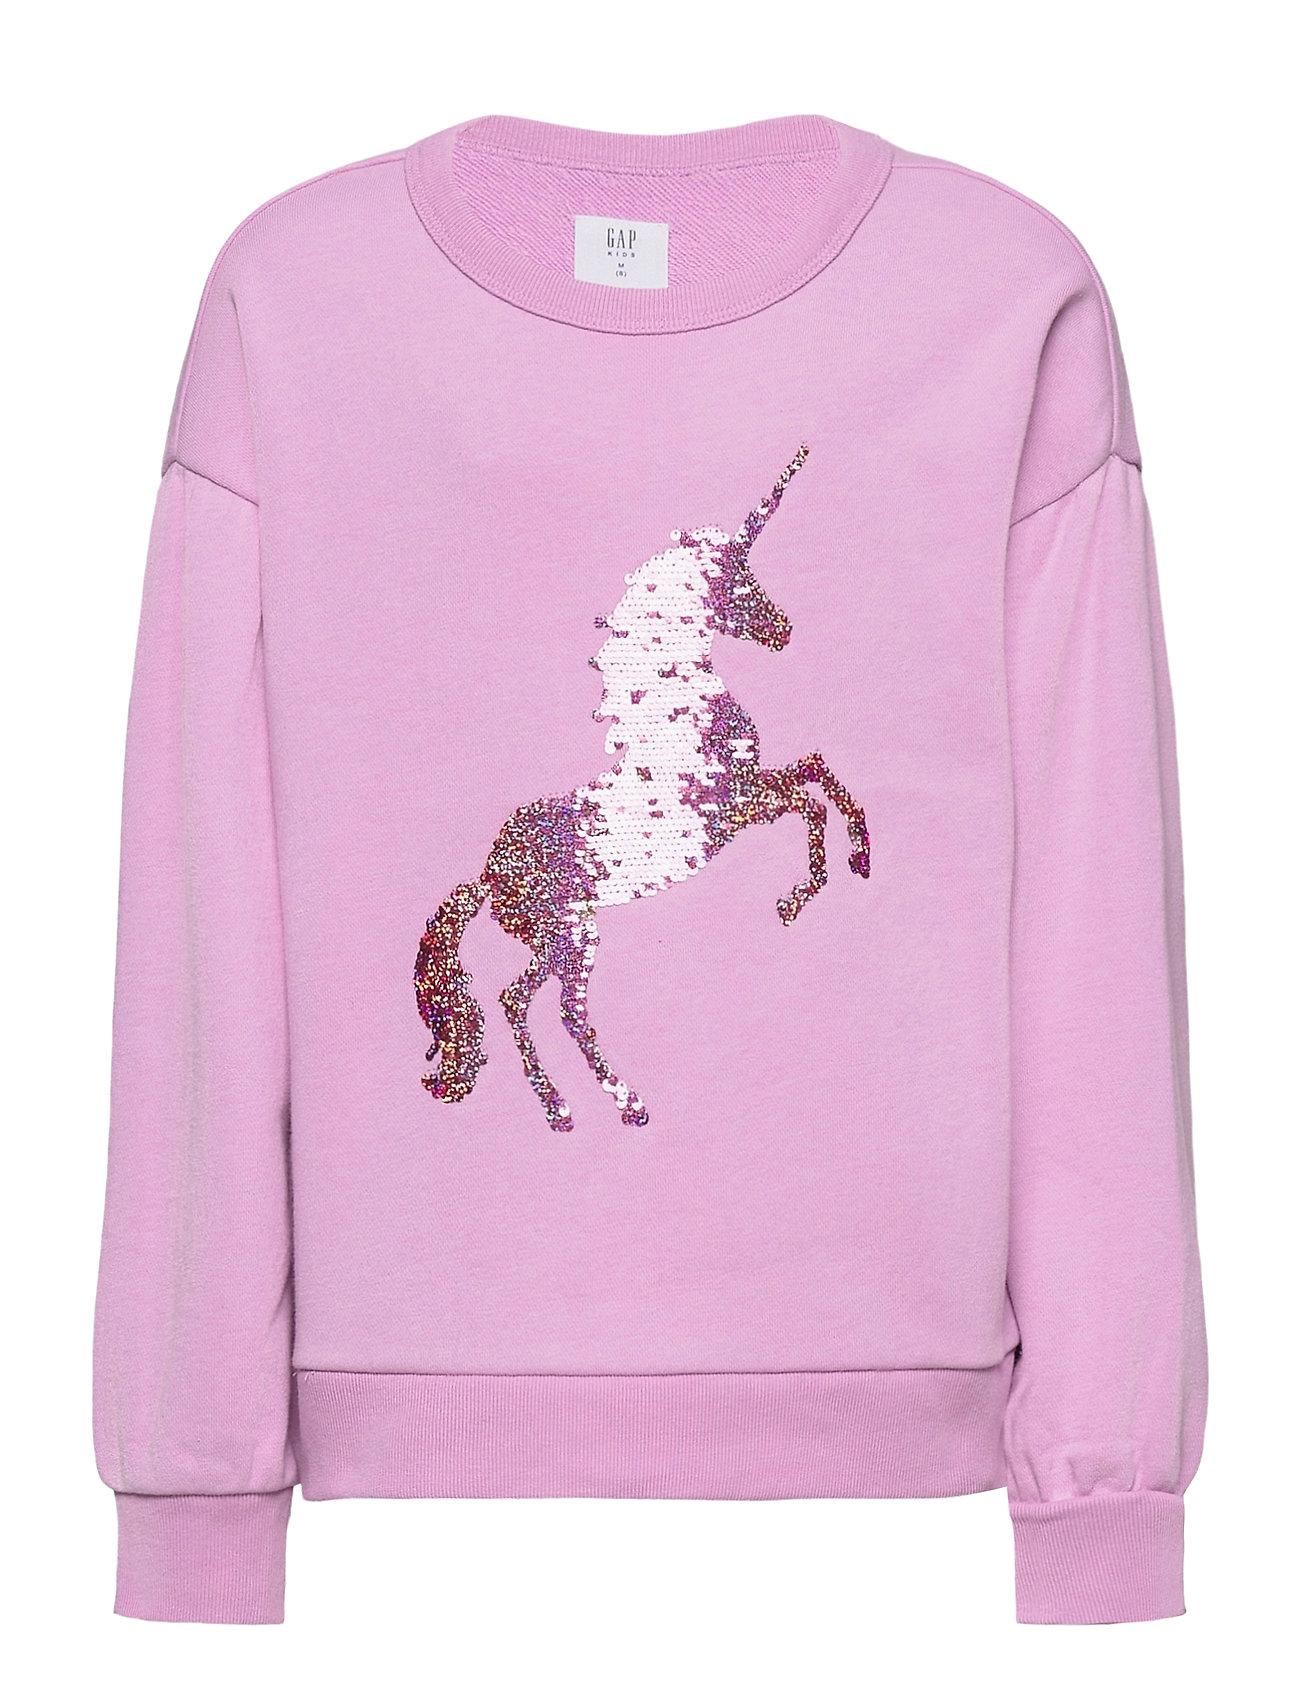 Image of Kids Flippy Sequin Crewneck Sweatshirt Sweatshirt Trøje Lyserød GAP (3464913865)